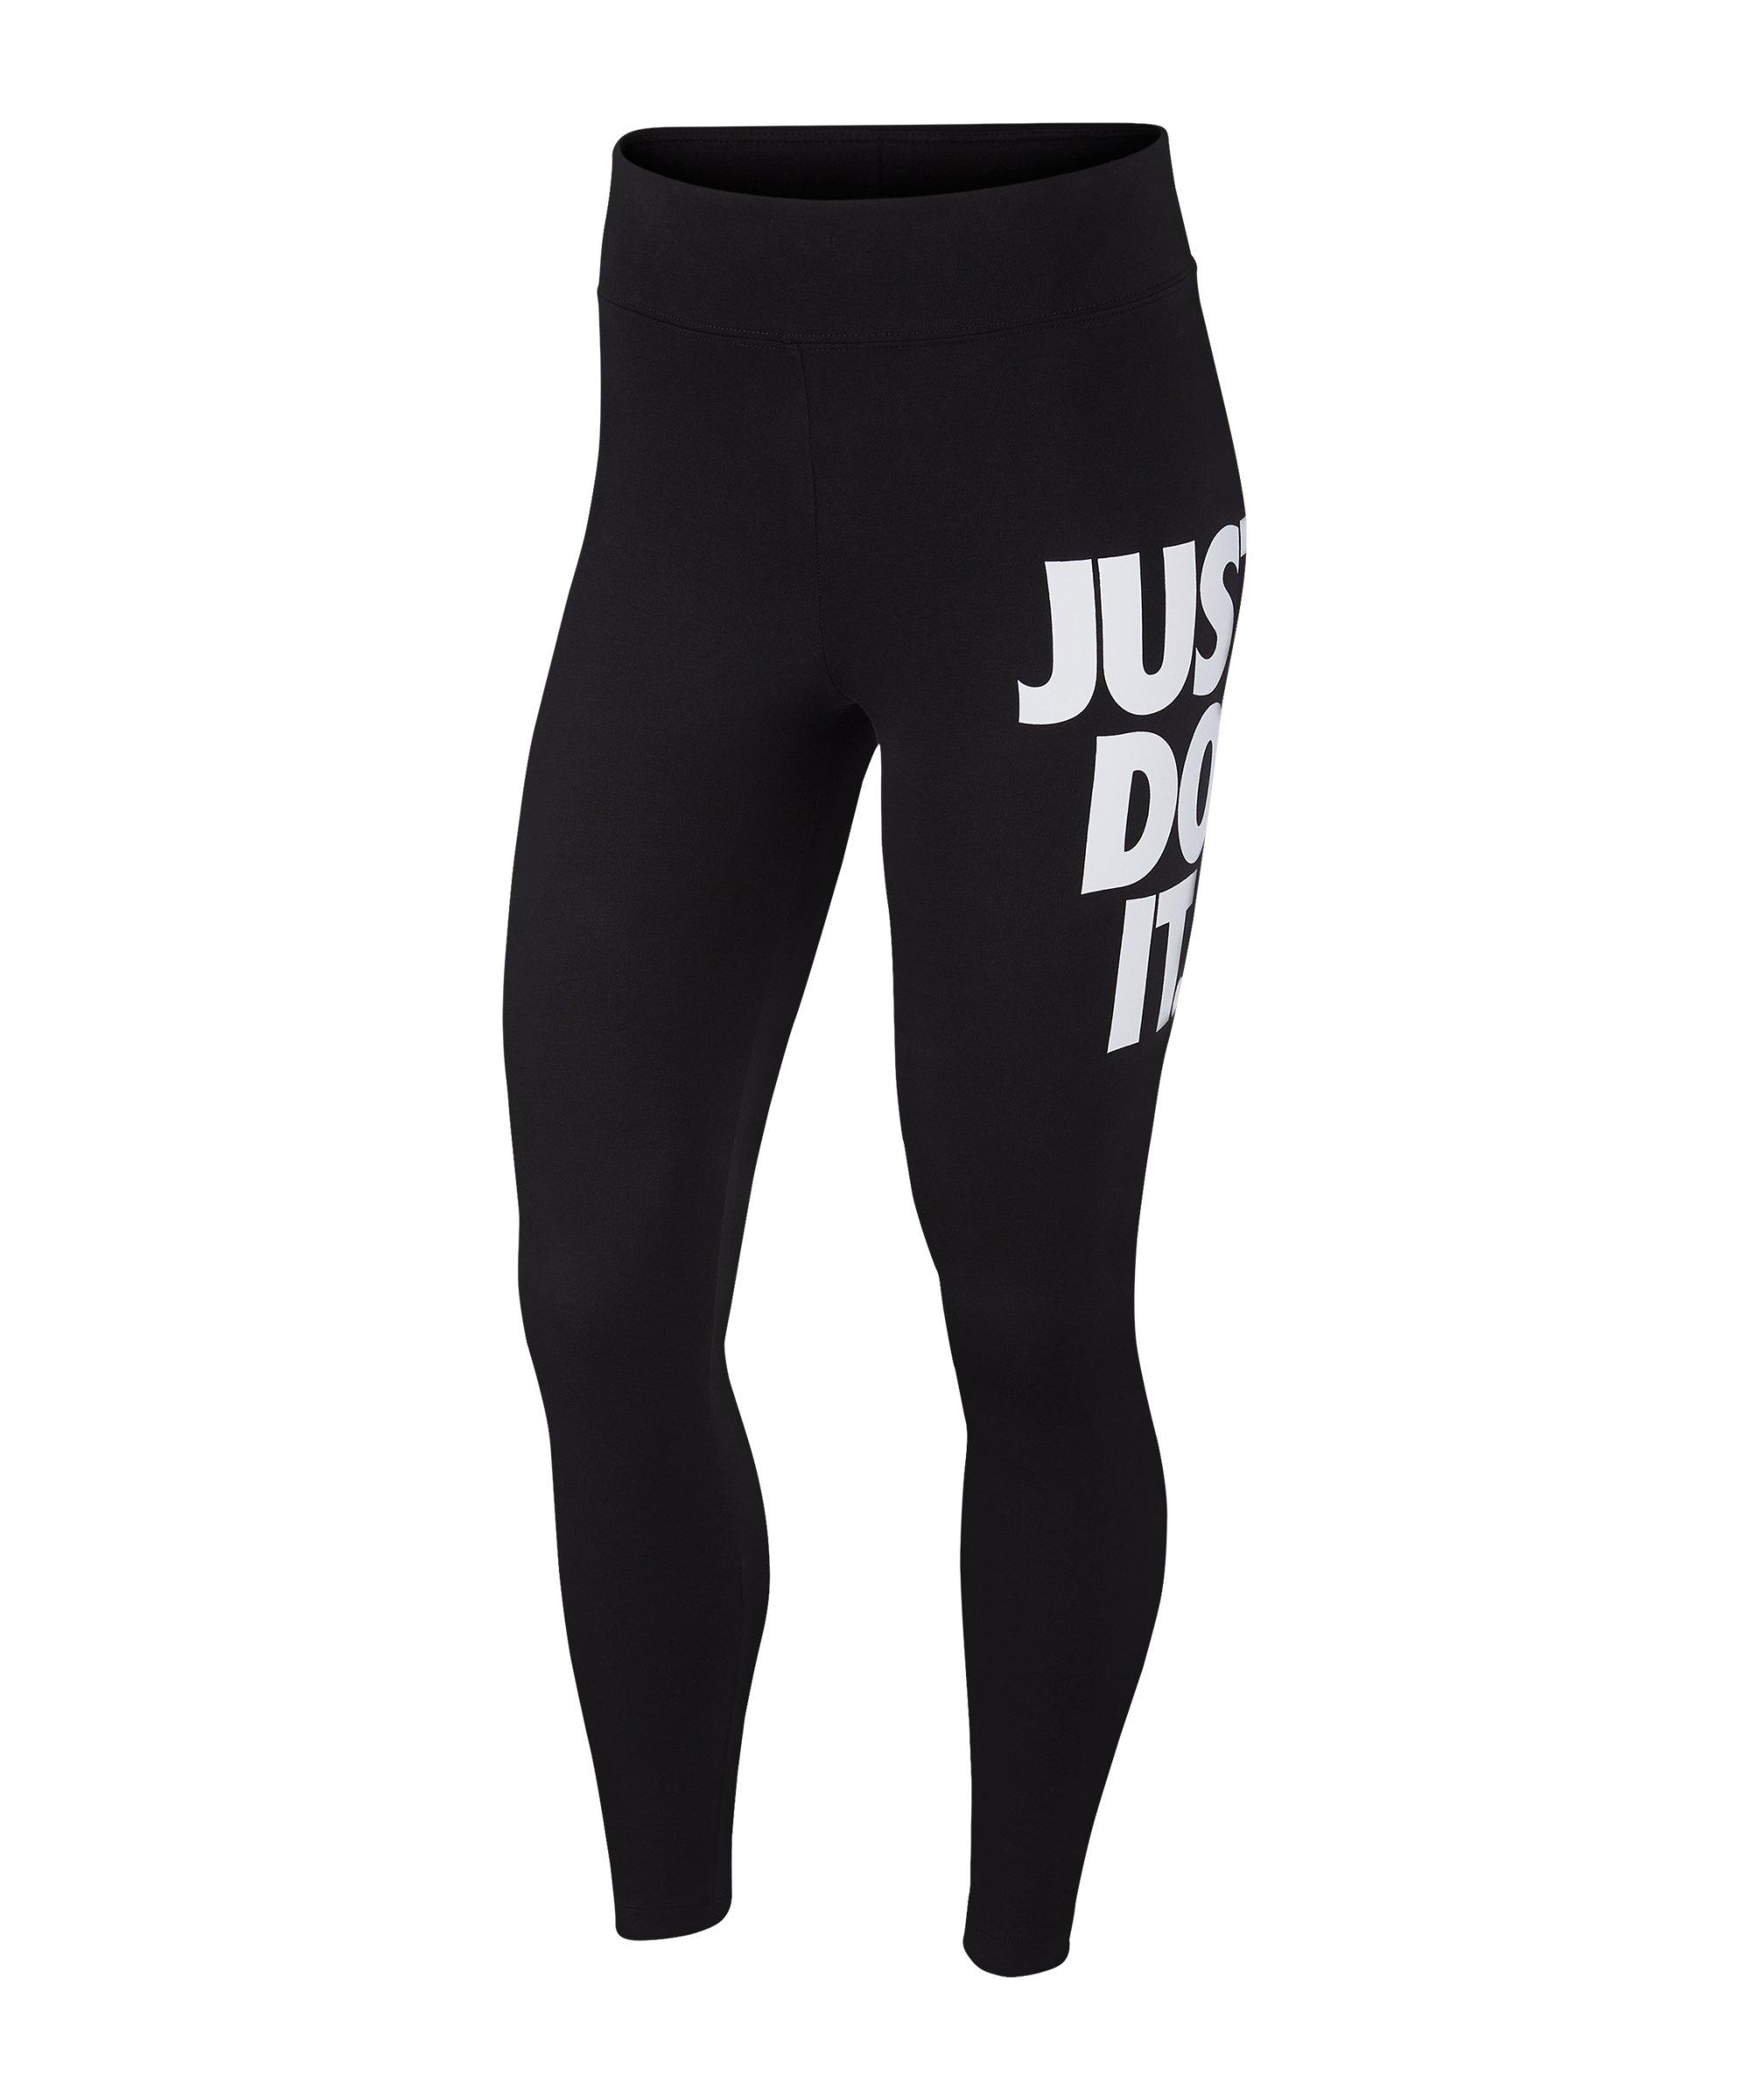 Nike JDI Legasee 7/8 Leggings Damen Schwarz F011 - schwarz